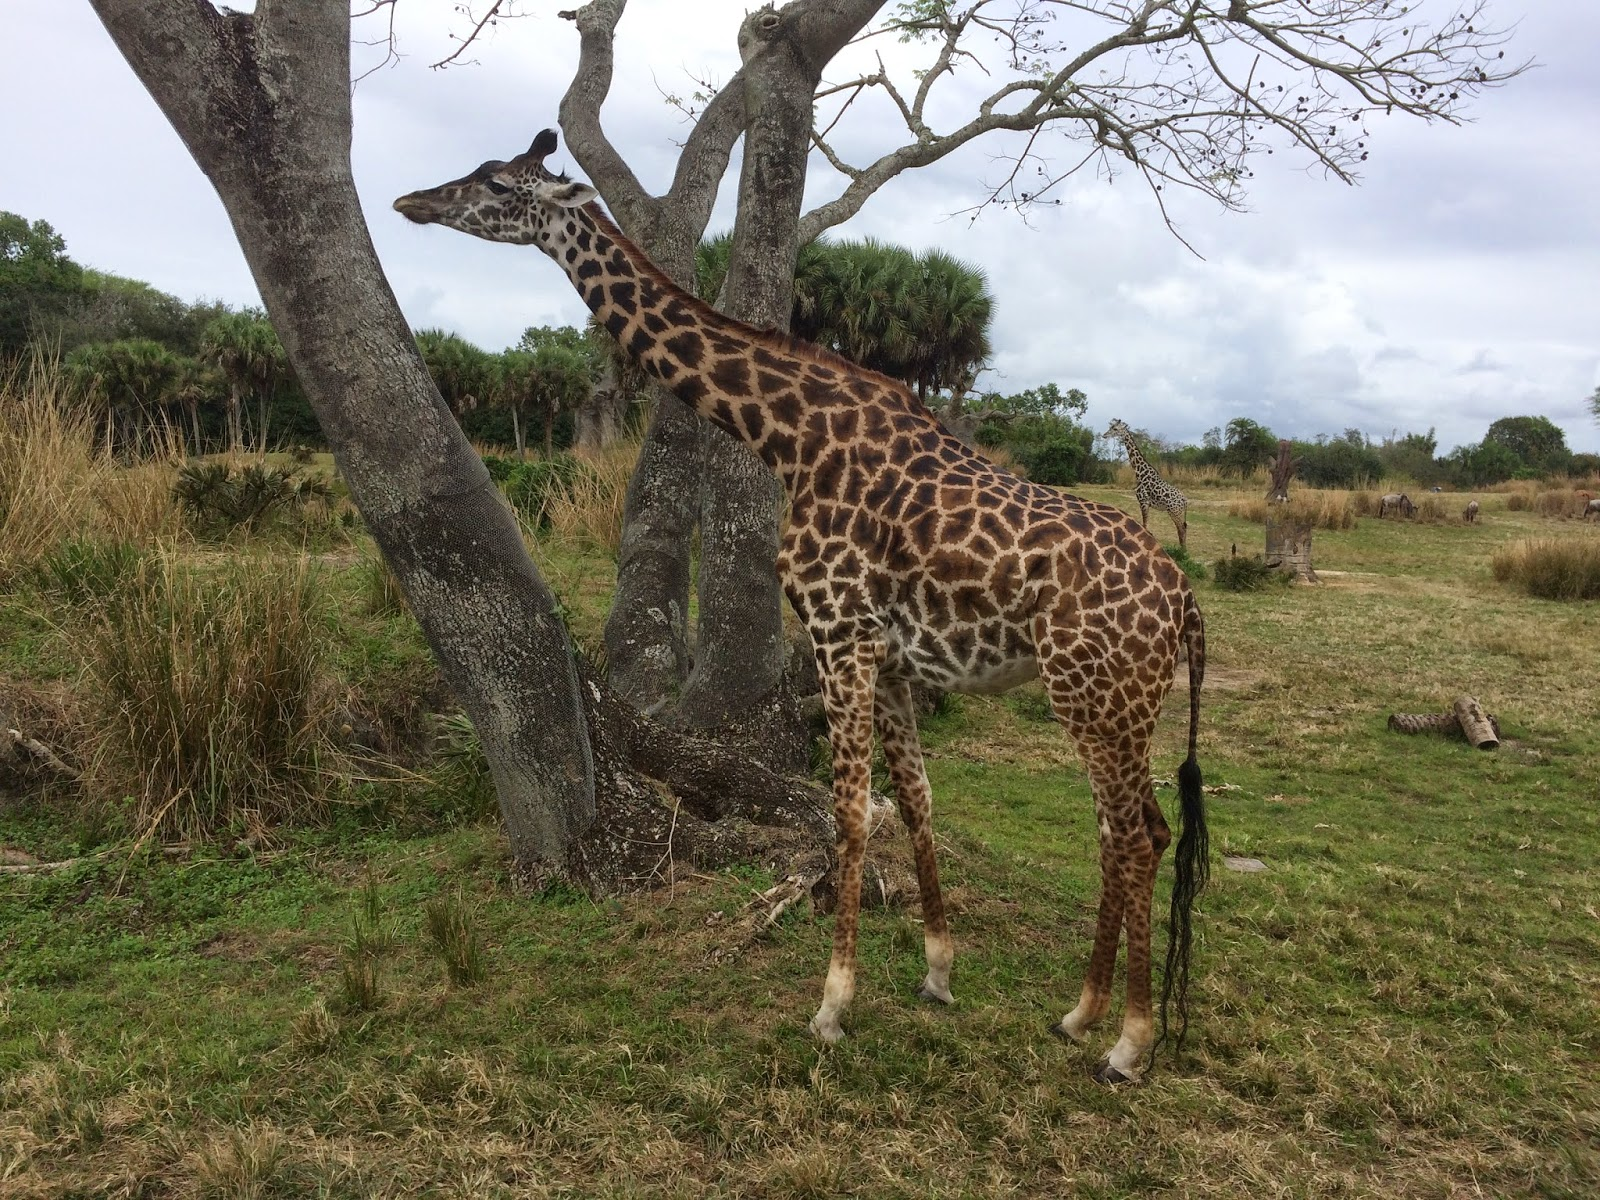 #ivysvariety giraffe at Animal Kingdom New Year's Resolution 2015